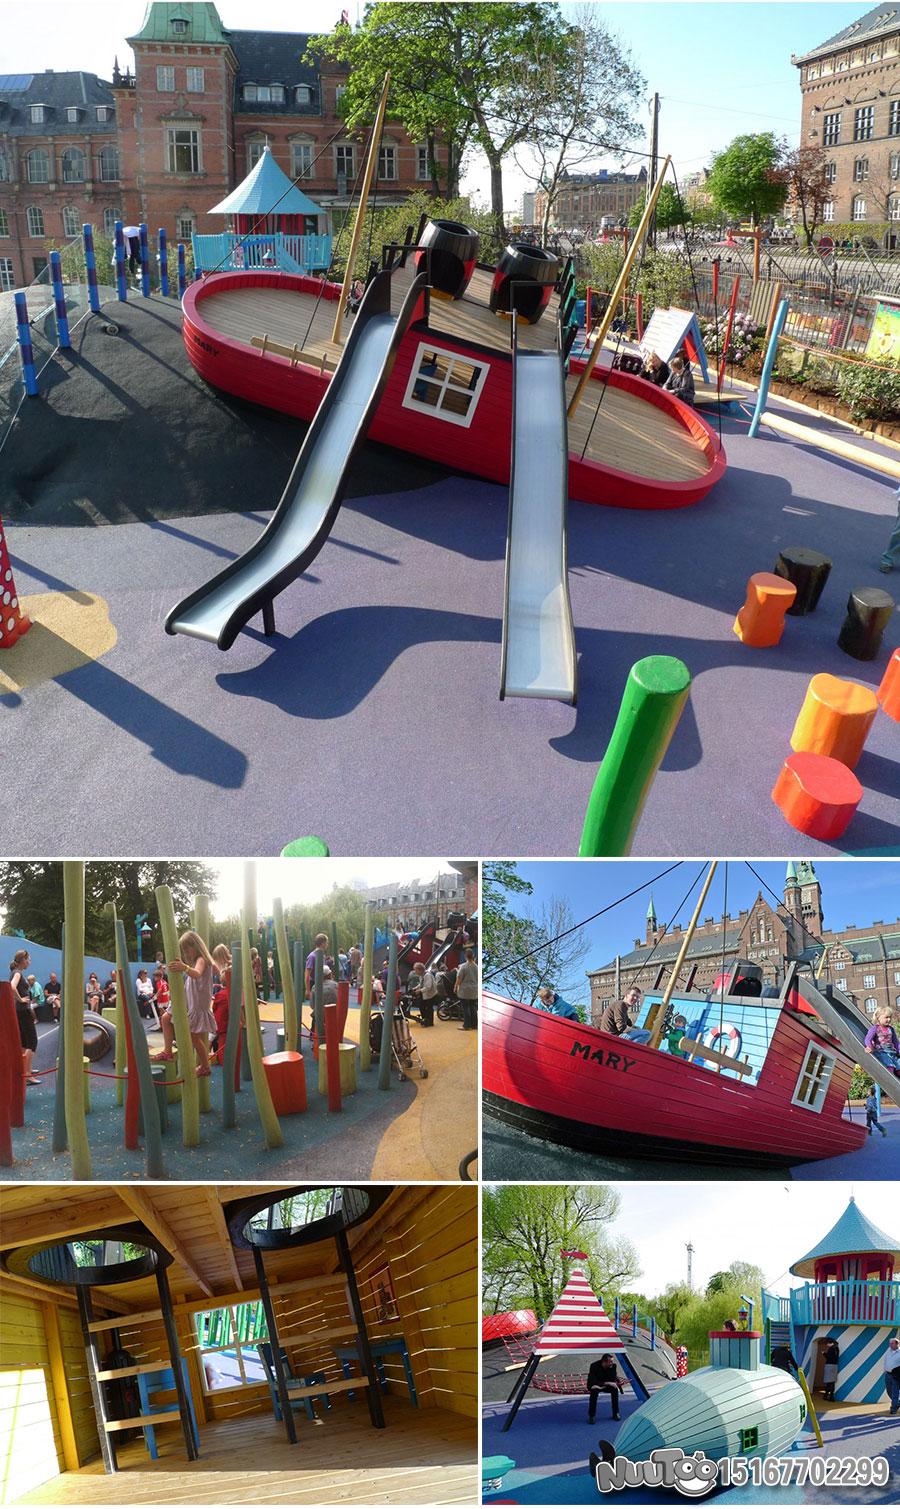 Non-standard amusement + personalized playground + amusement equipment + rides + outdoor children's play facilities _10